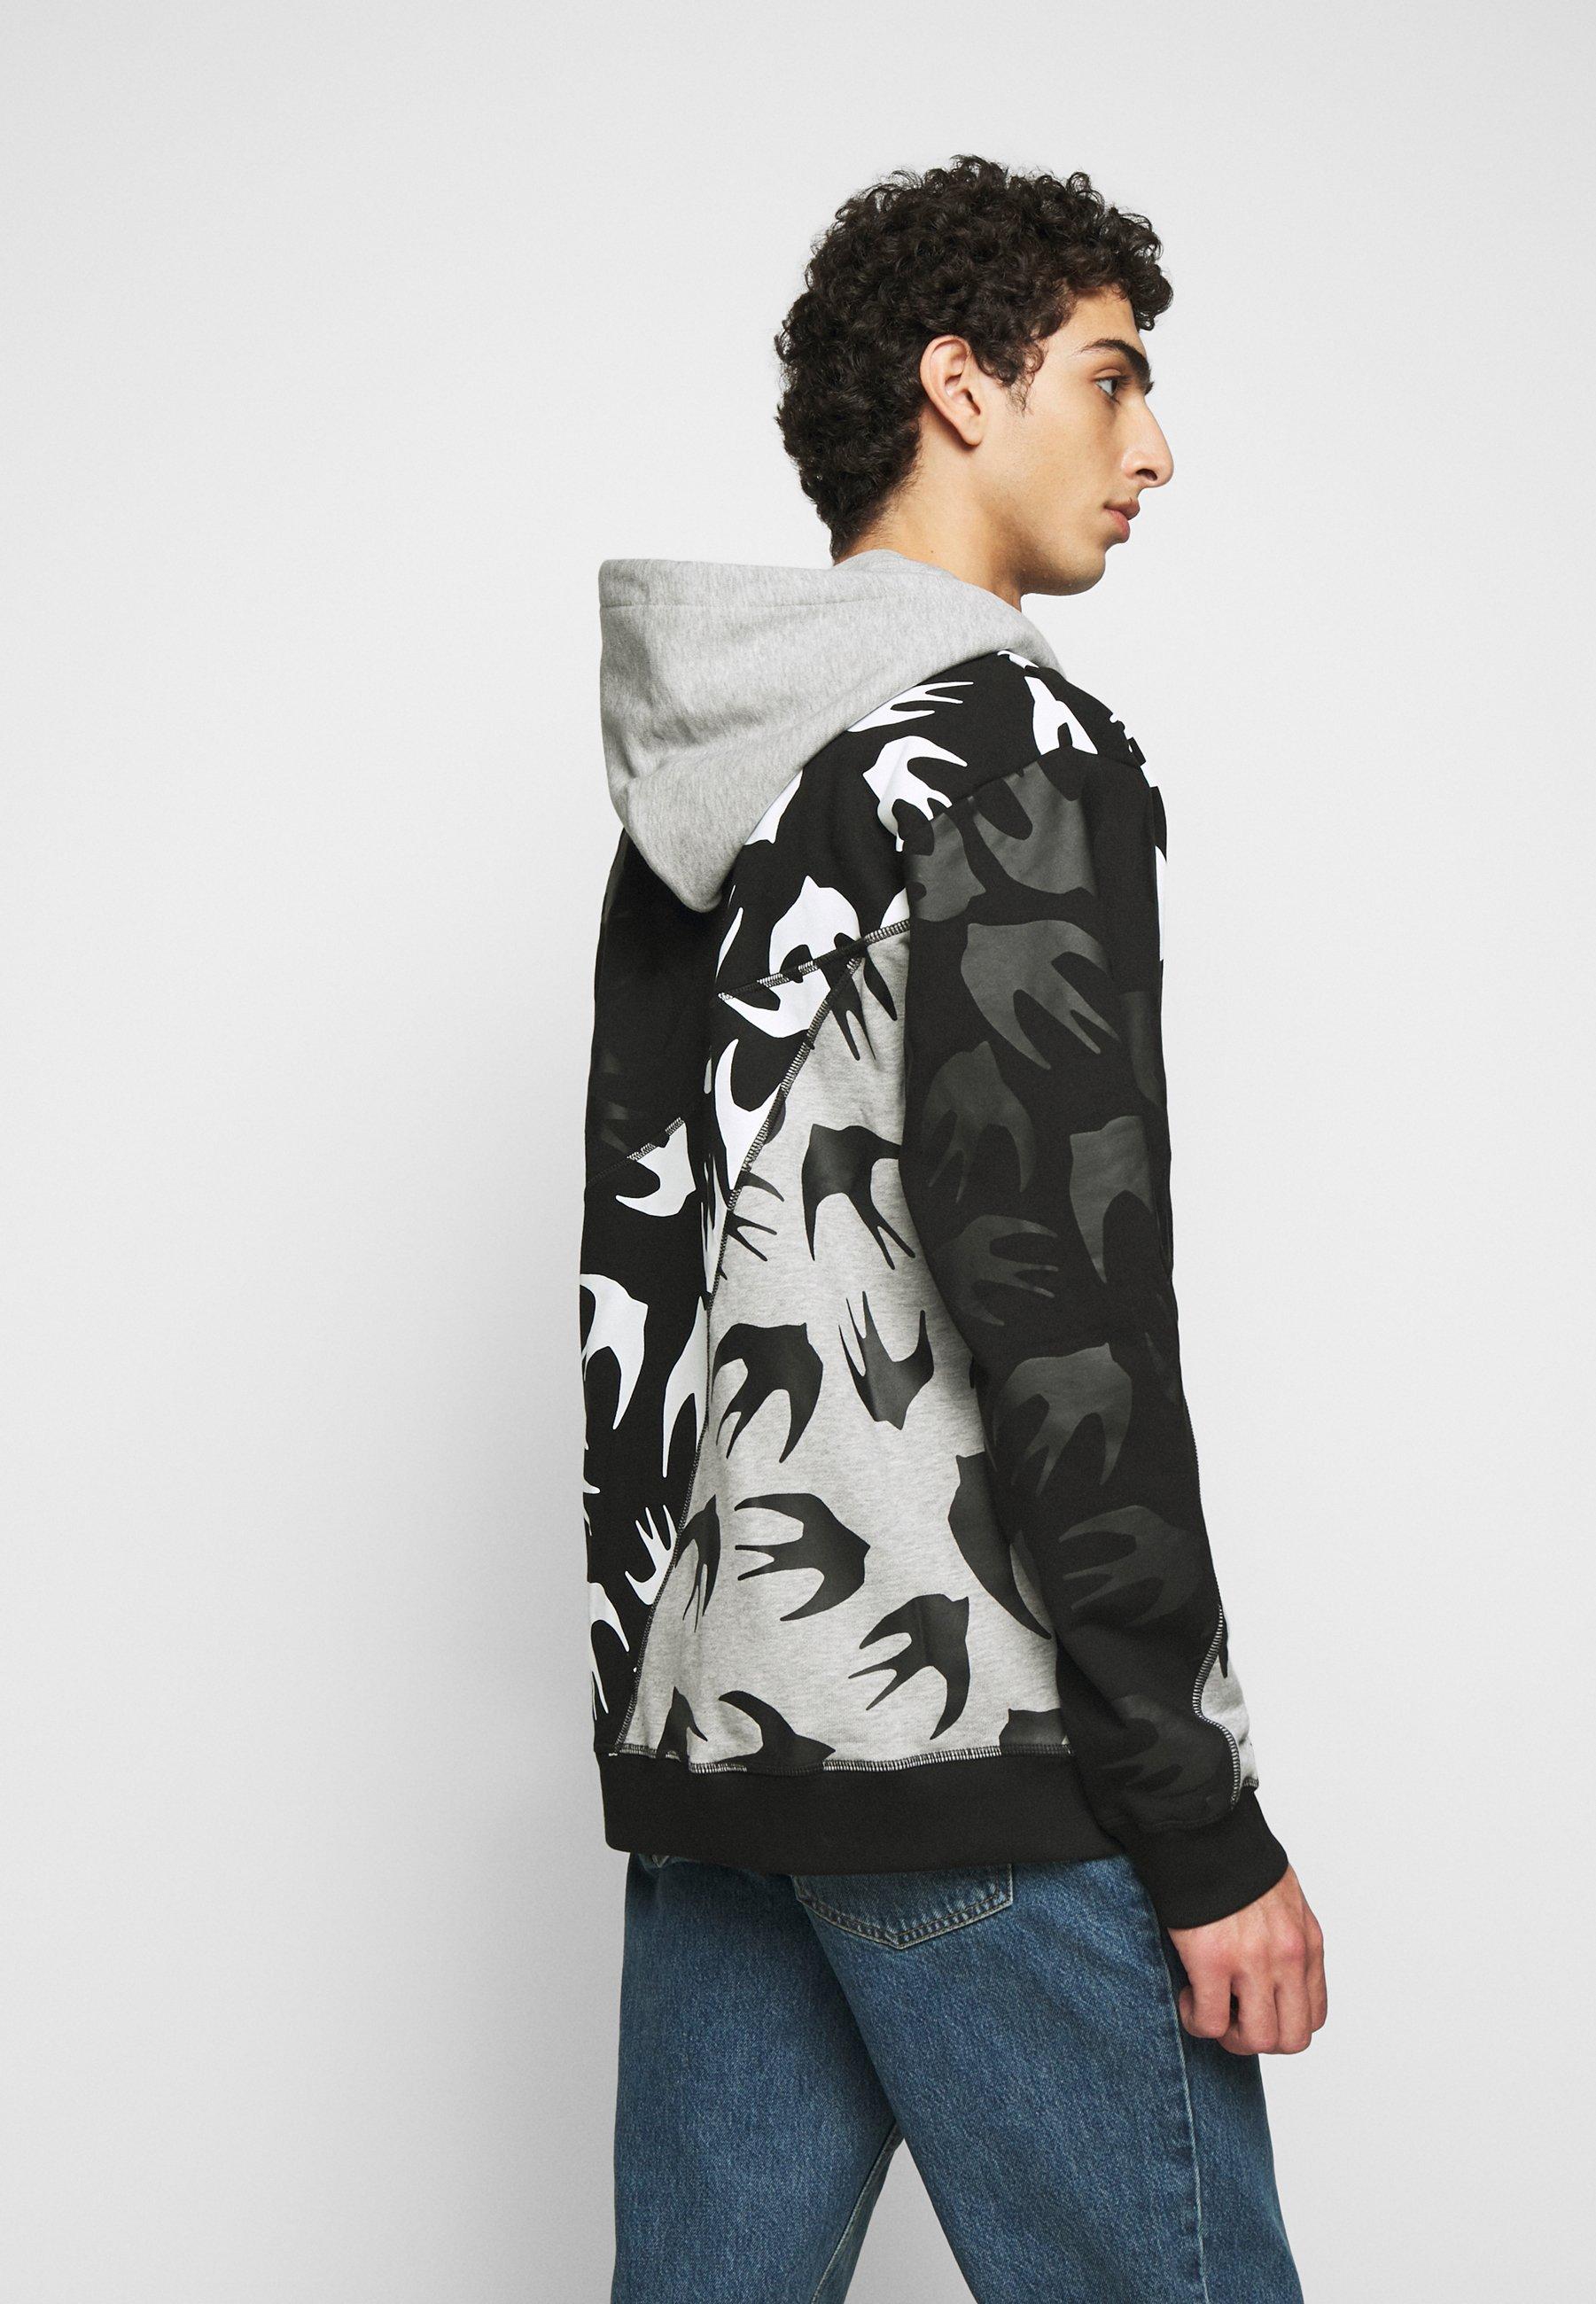 Mcq Alexander Mcqueen Cut Up Hood - Kapuzenpullover Black/grey